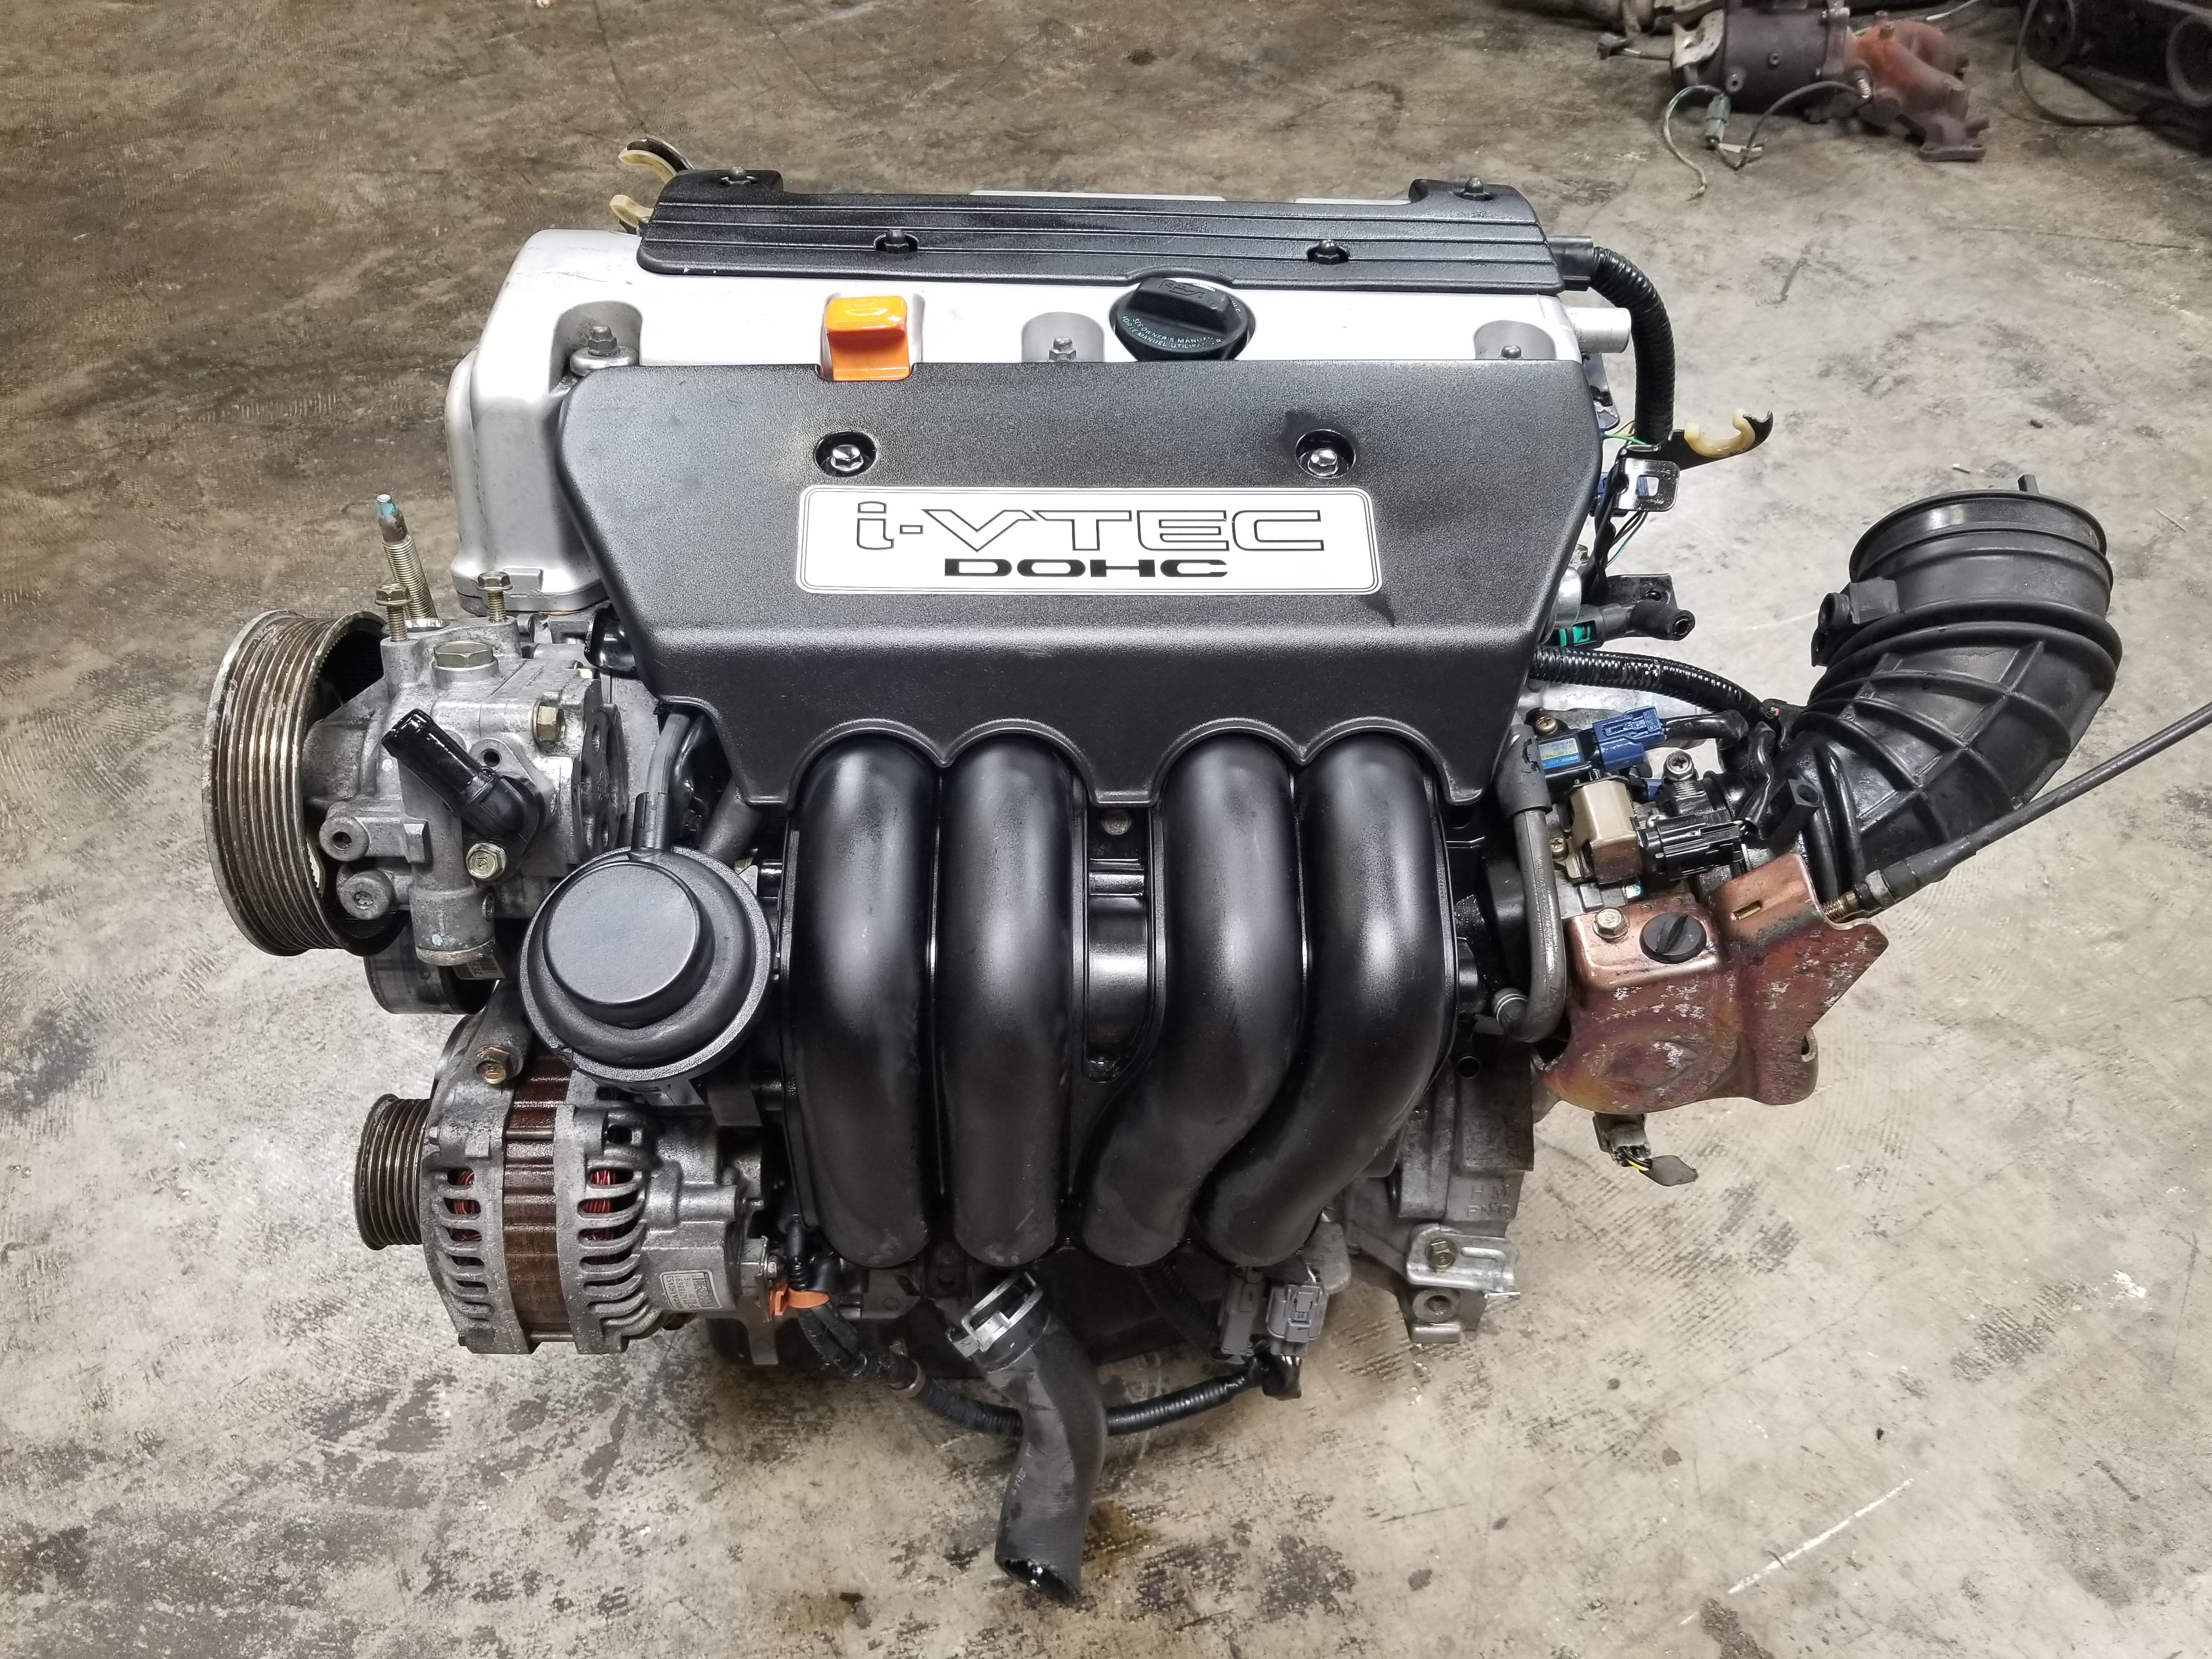 K20 2002-2006 ACURA RSX BASE CIVIC SI 2.0 ENGINE JDM K20A ...